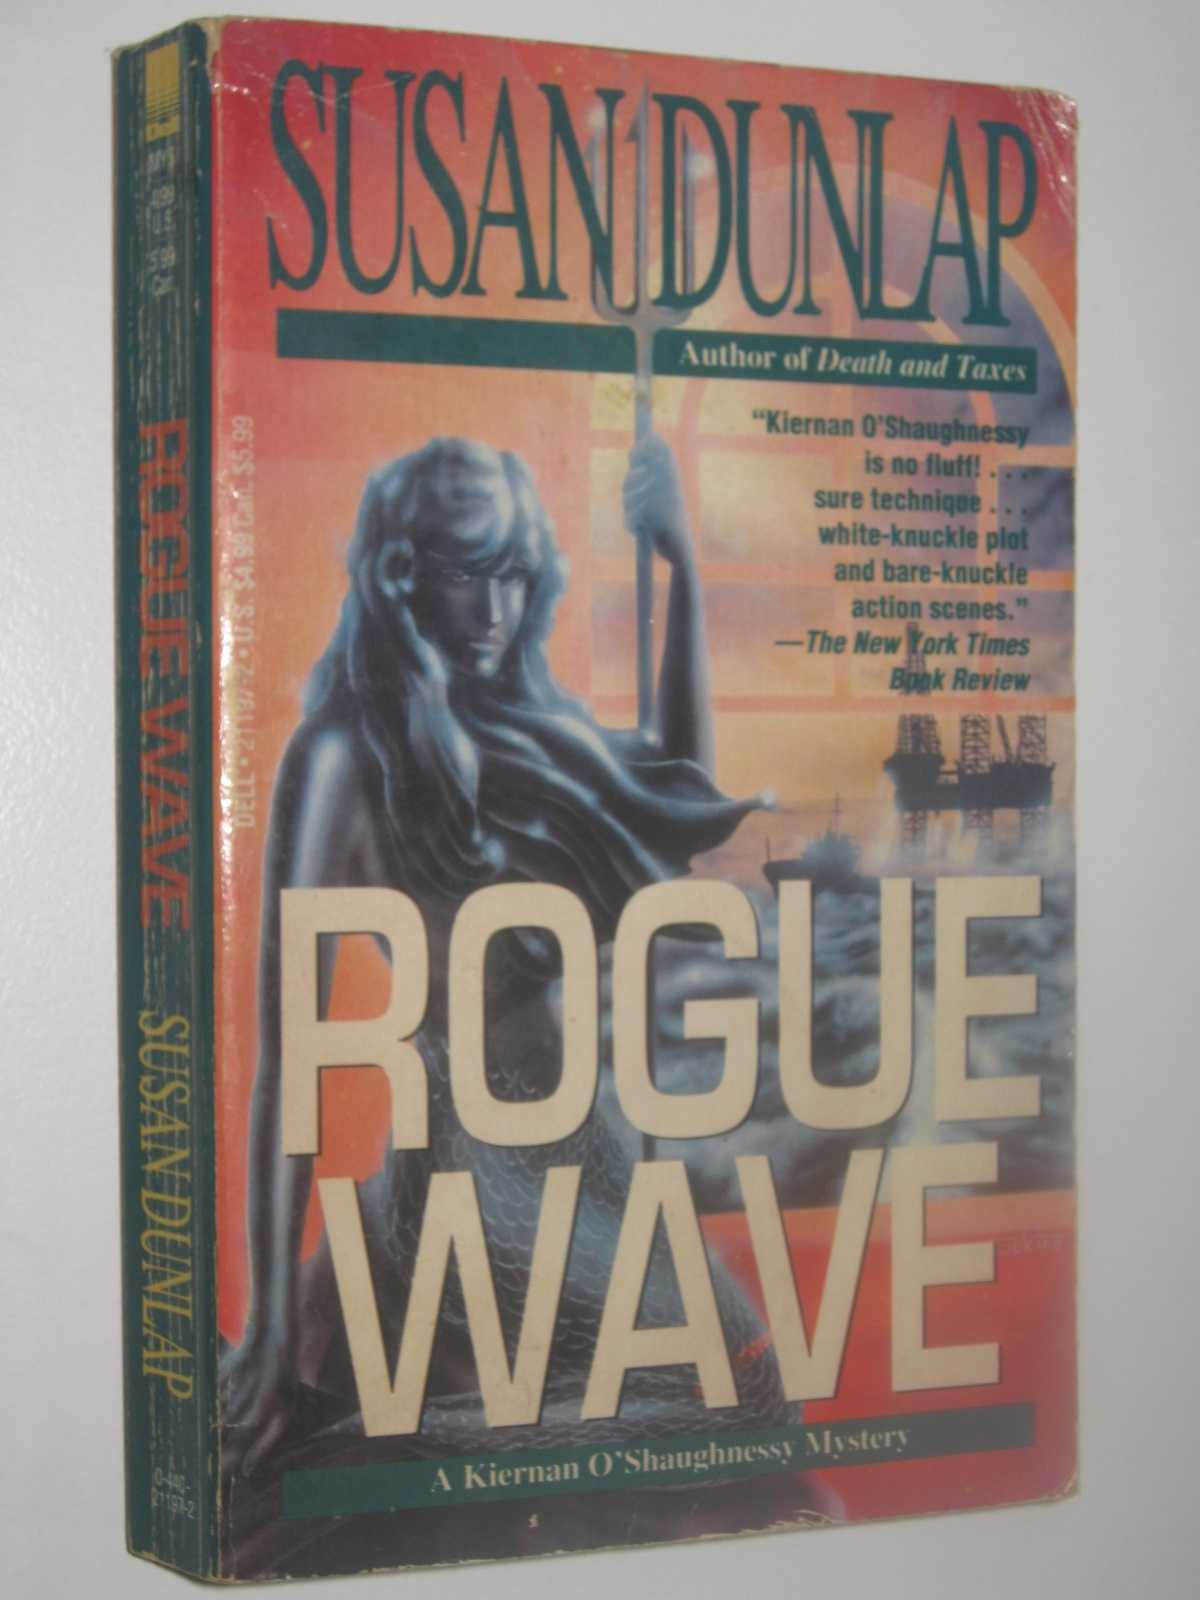 Rogue Wave - A Kiernan O'Shaughnessy Mystery, Dunlap, Susan